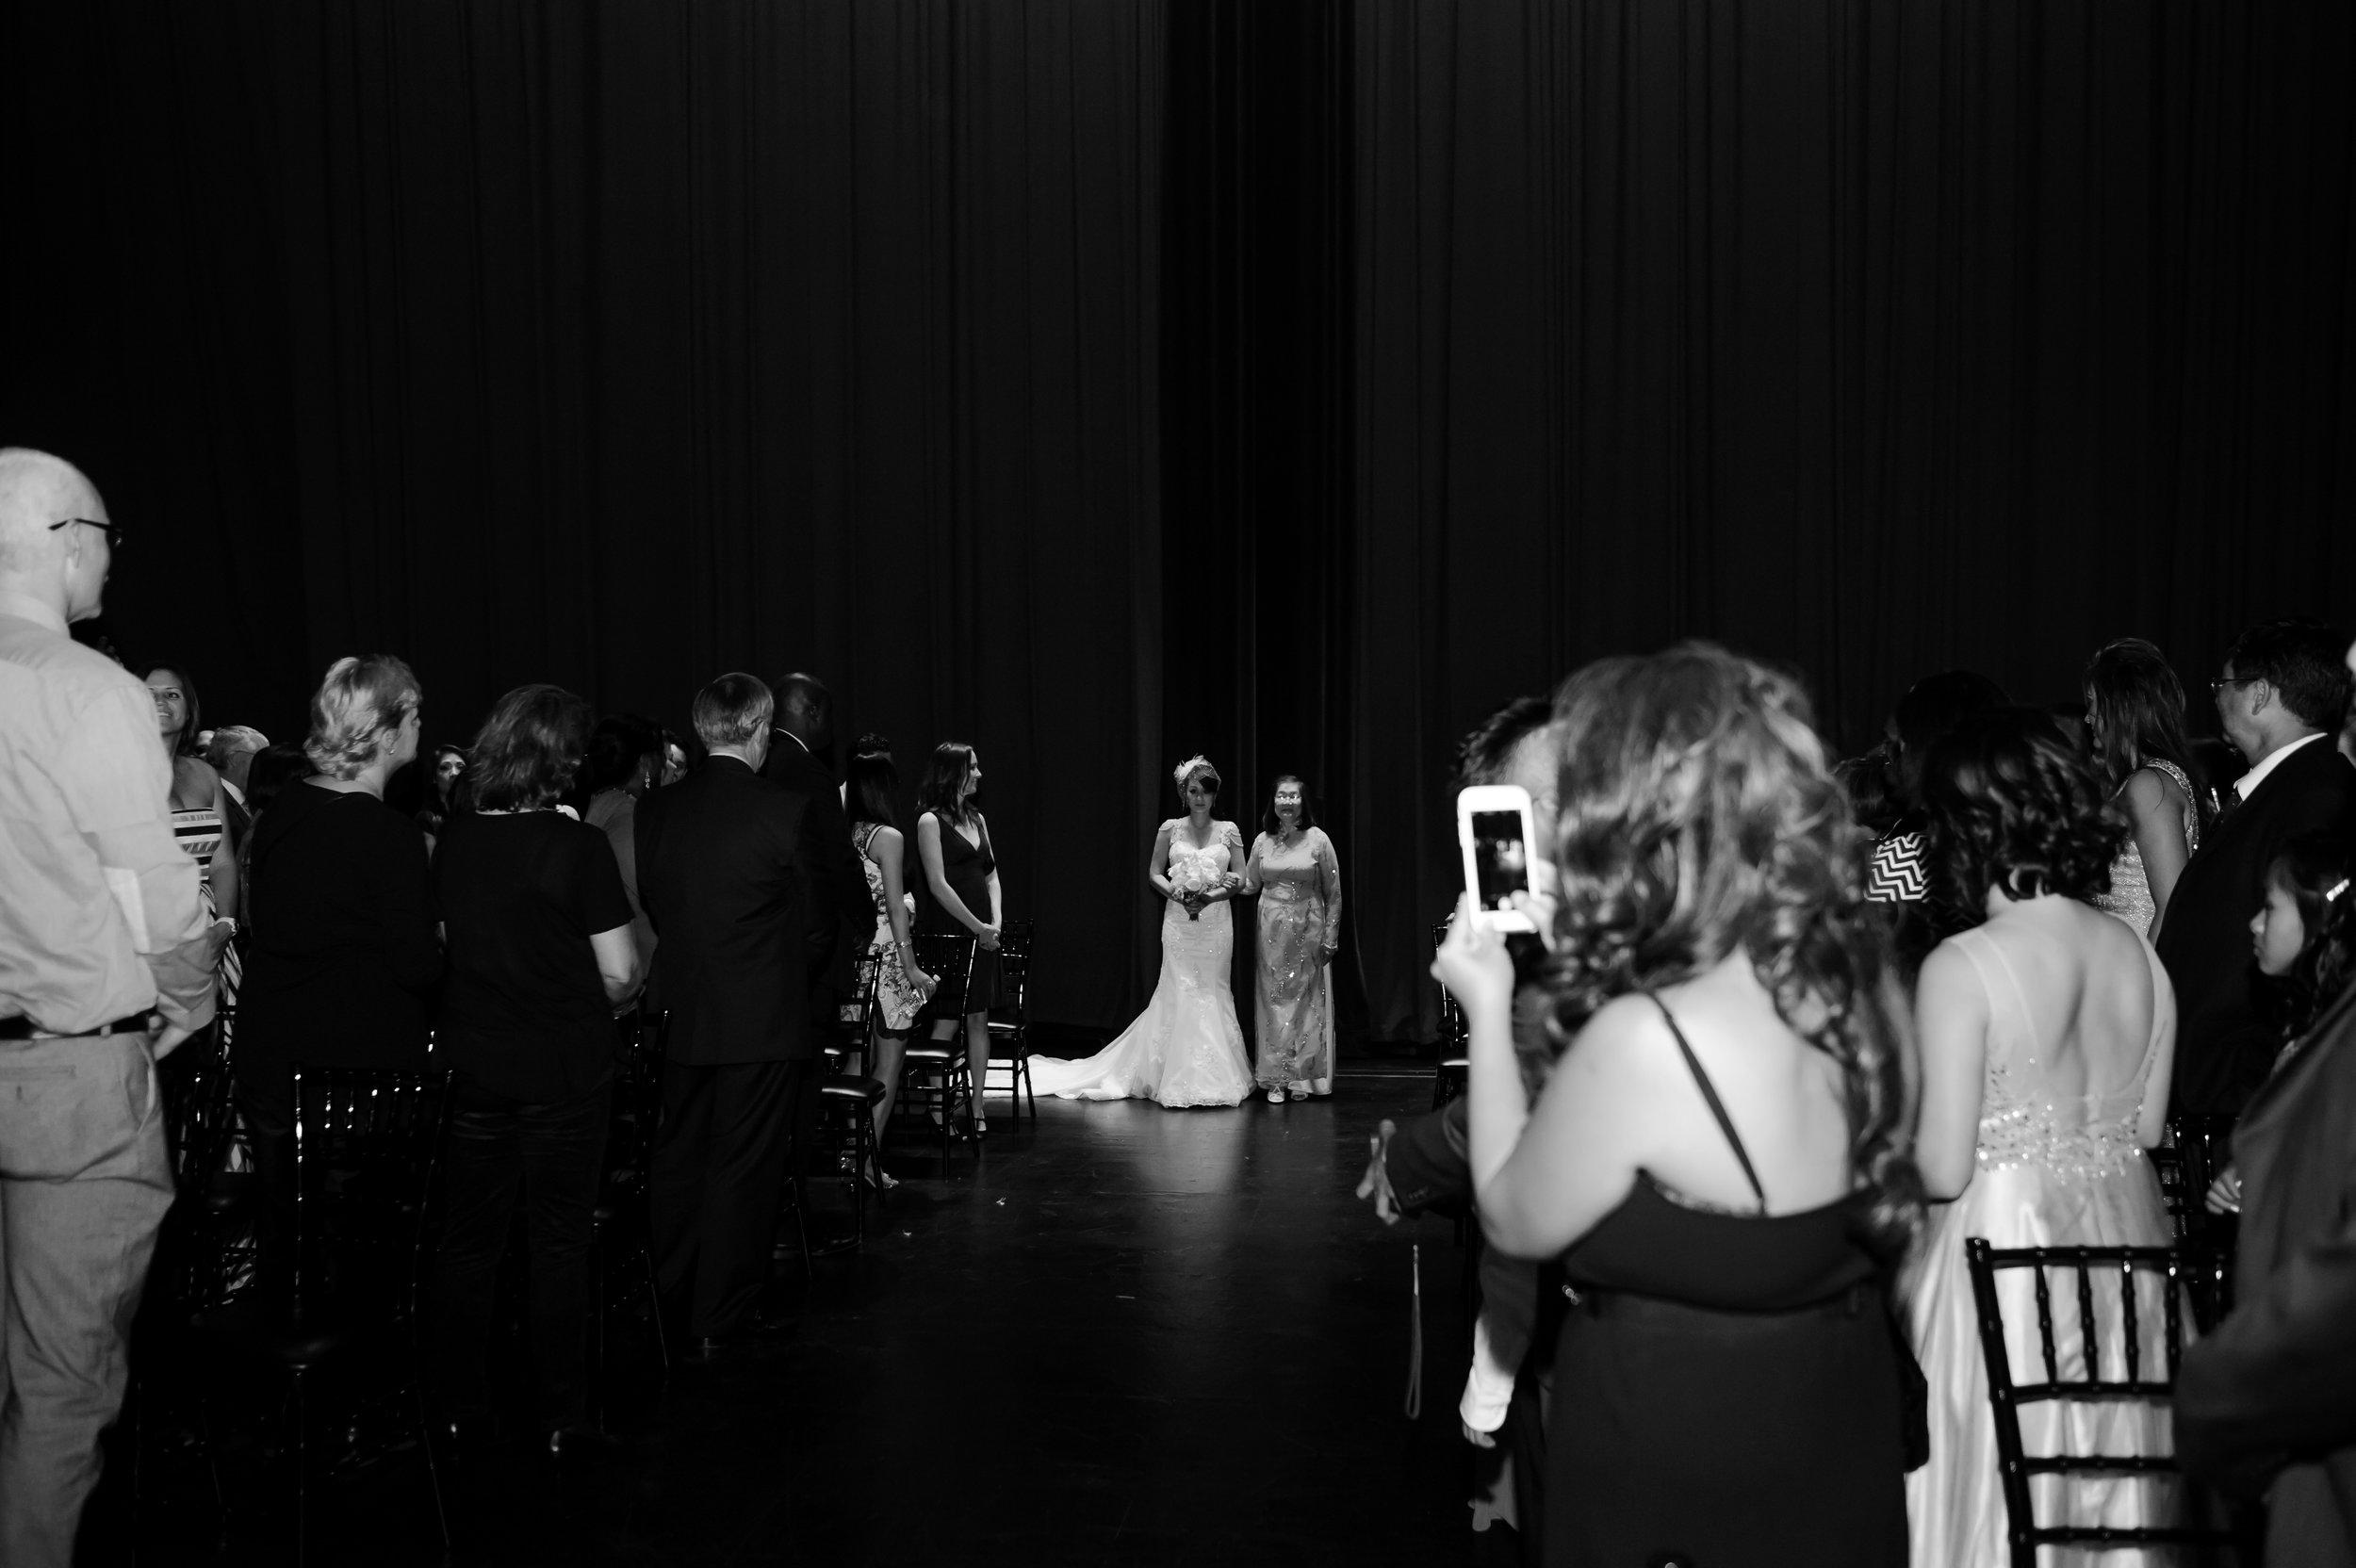 camilla-thuy-089-memorial-auditorium-sacramento-wedding-photographer-katherine-nicole-photography.JPG